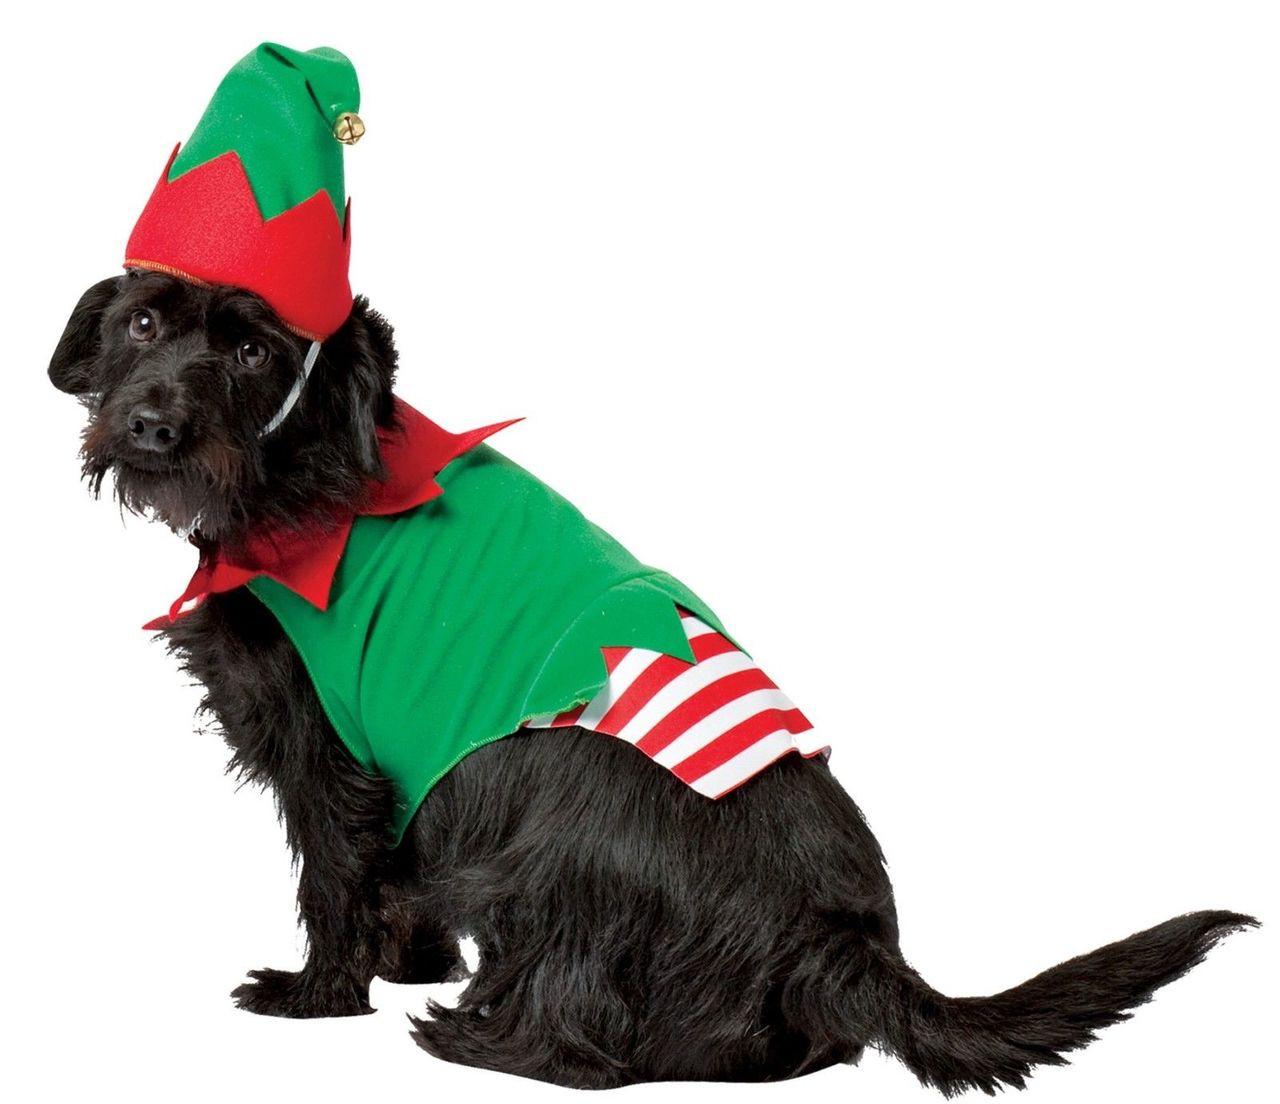 da2c5f6bc93b7 Rasta Imposta Santa s Helper Hat One Piece Elf Dog Pets Christmas Costume  GC5028 - Fearless Apparel